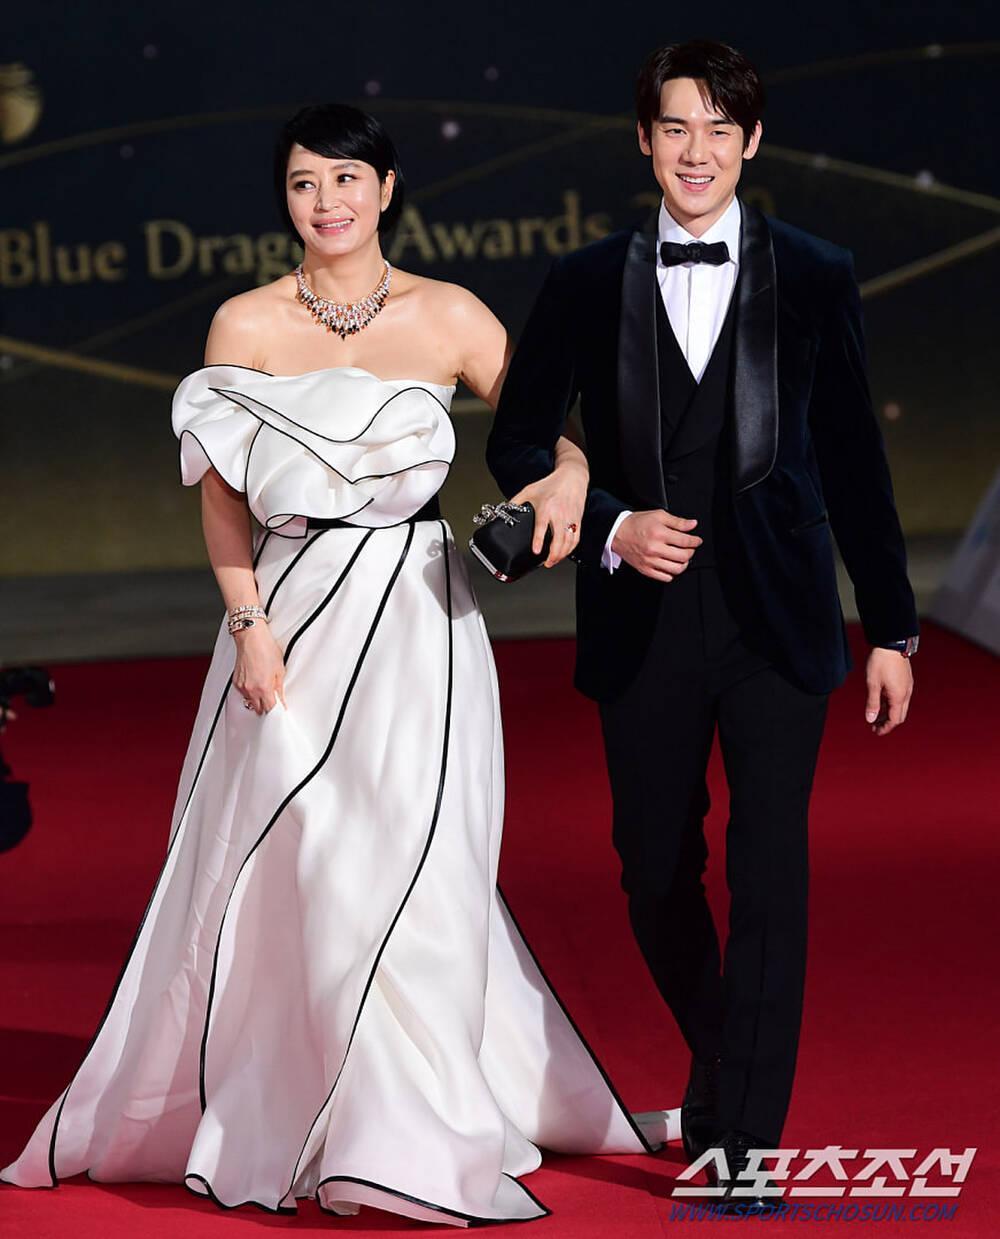 Thảm đỏ 'Rồng xanh 2020': Shin Hye Sun 'cân sắc' Shin Min Ah, Jung Woo Sung - Lee Byung Hun điển trai! Ảnh 3